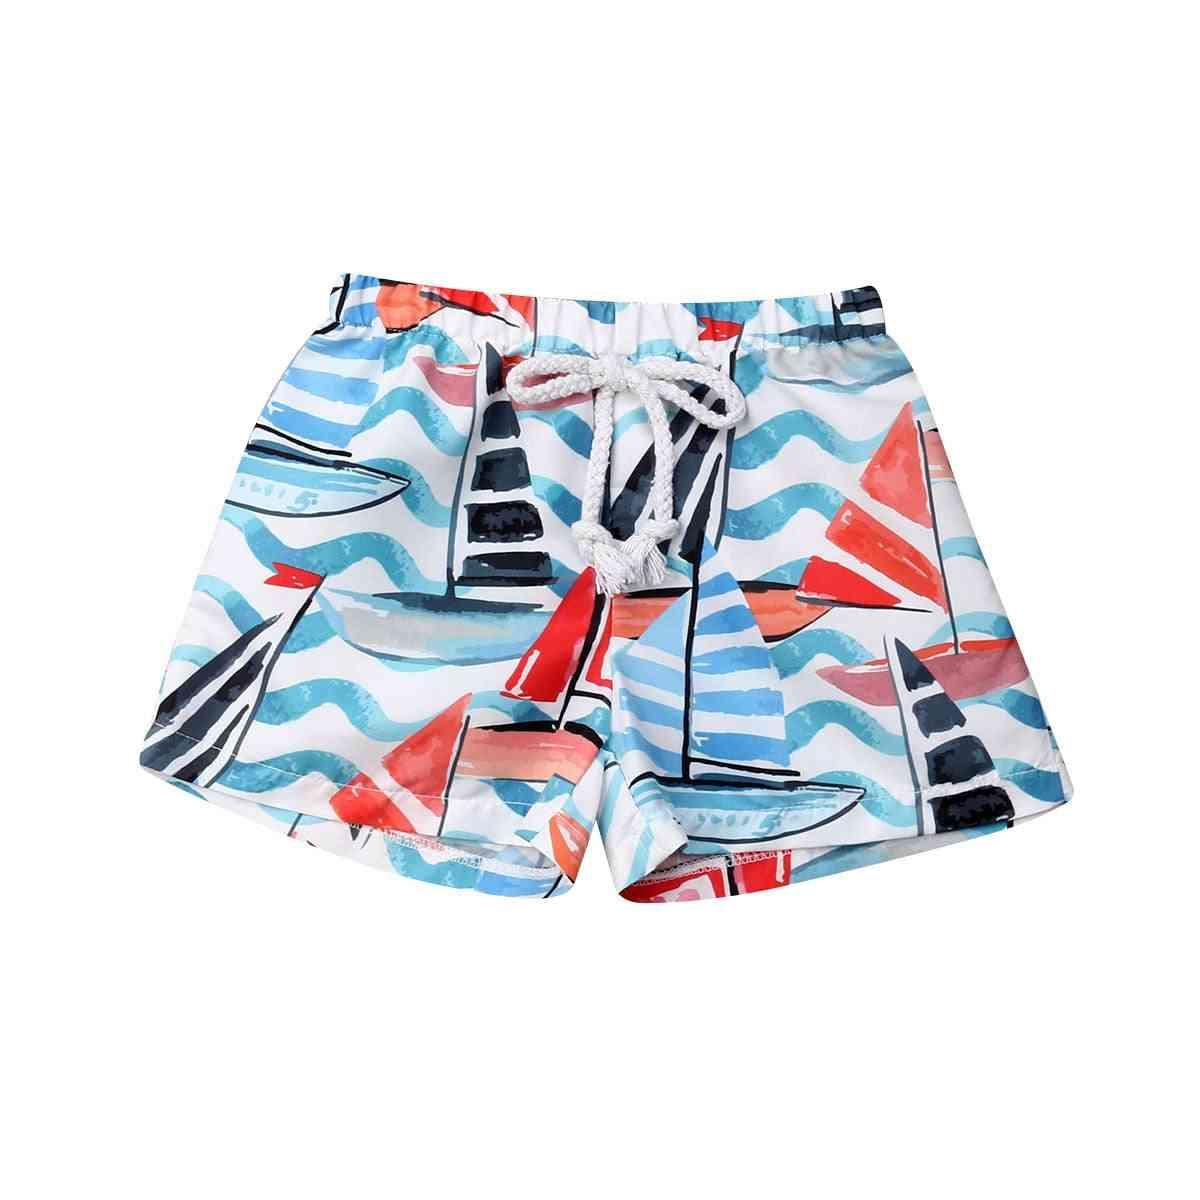 Baby Elastic Waist Short Trunk Summer Holiday Swimwear Beachwear Shorts